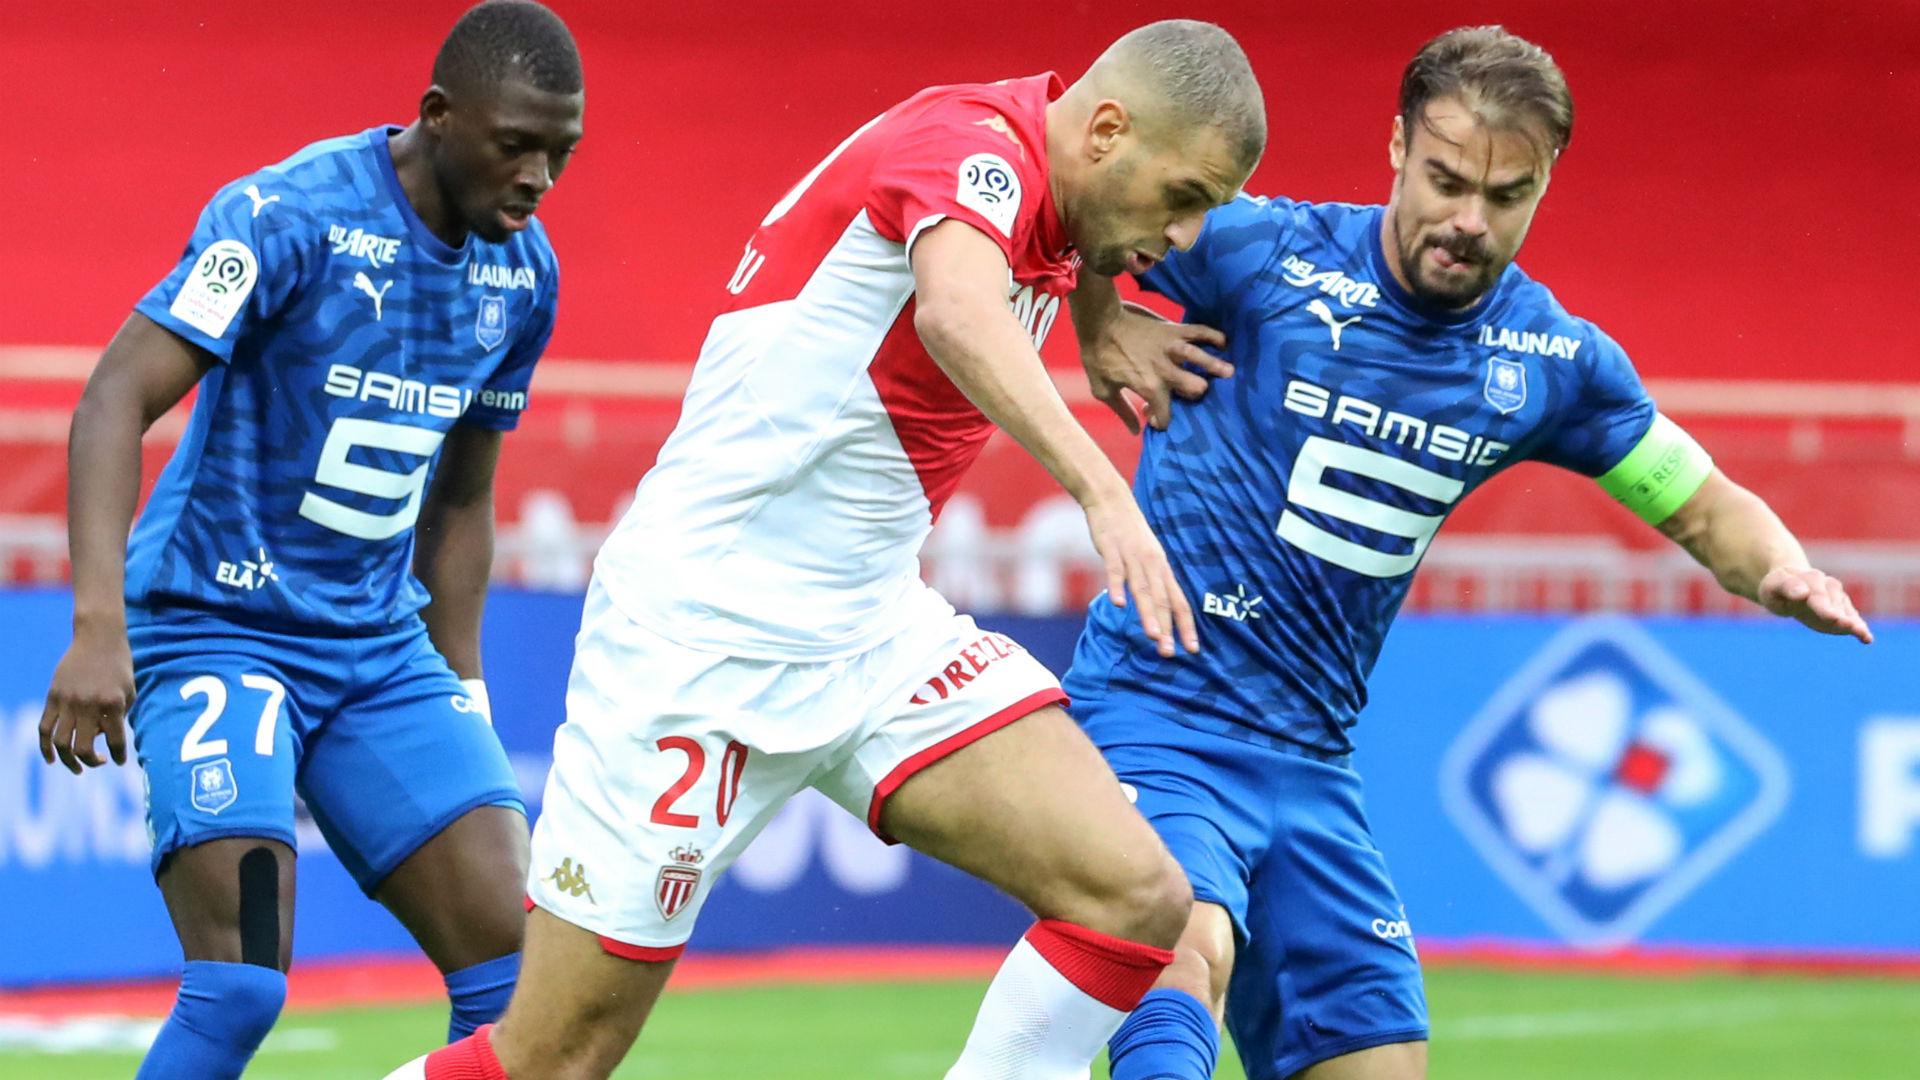 Monaco boss Jardim waits on Slimani ahead of Dijon clash